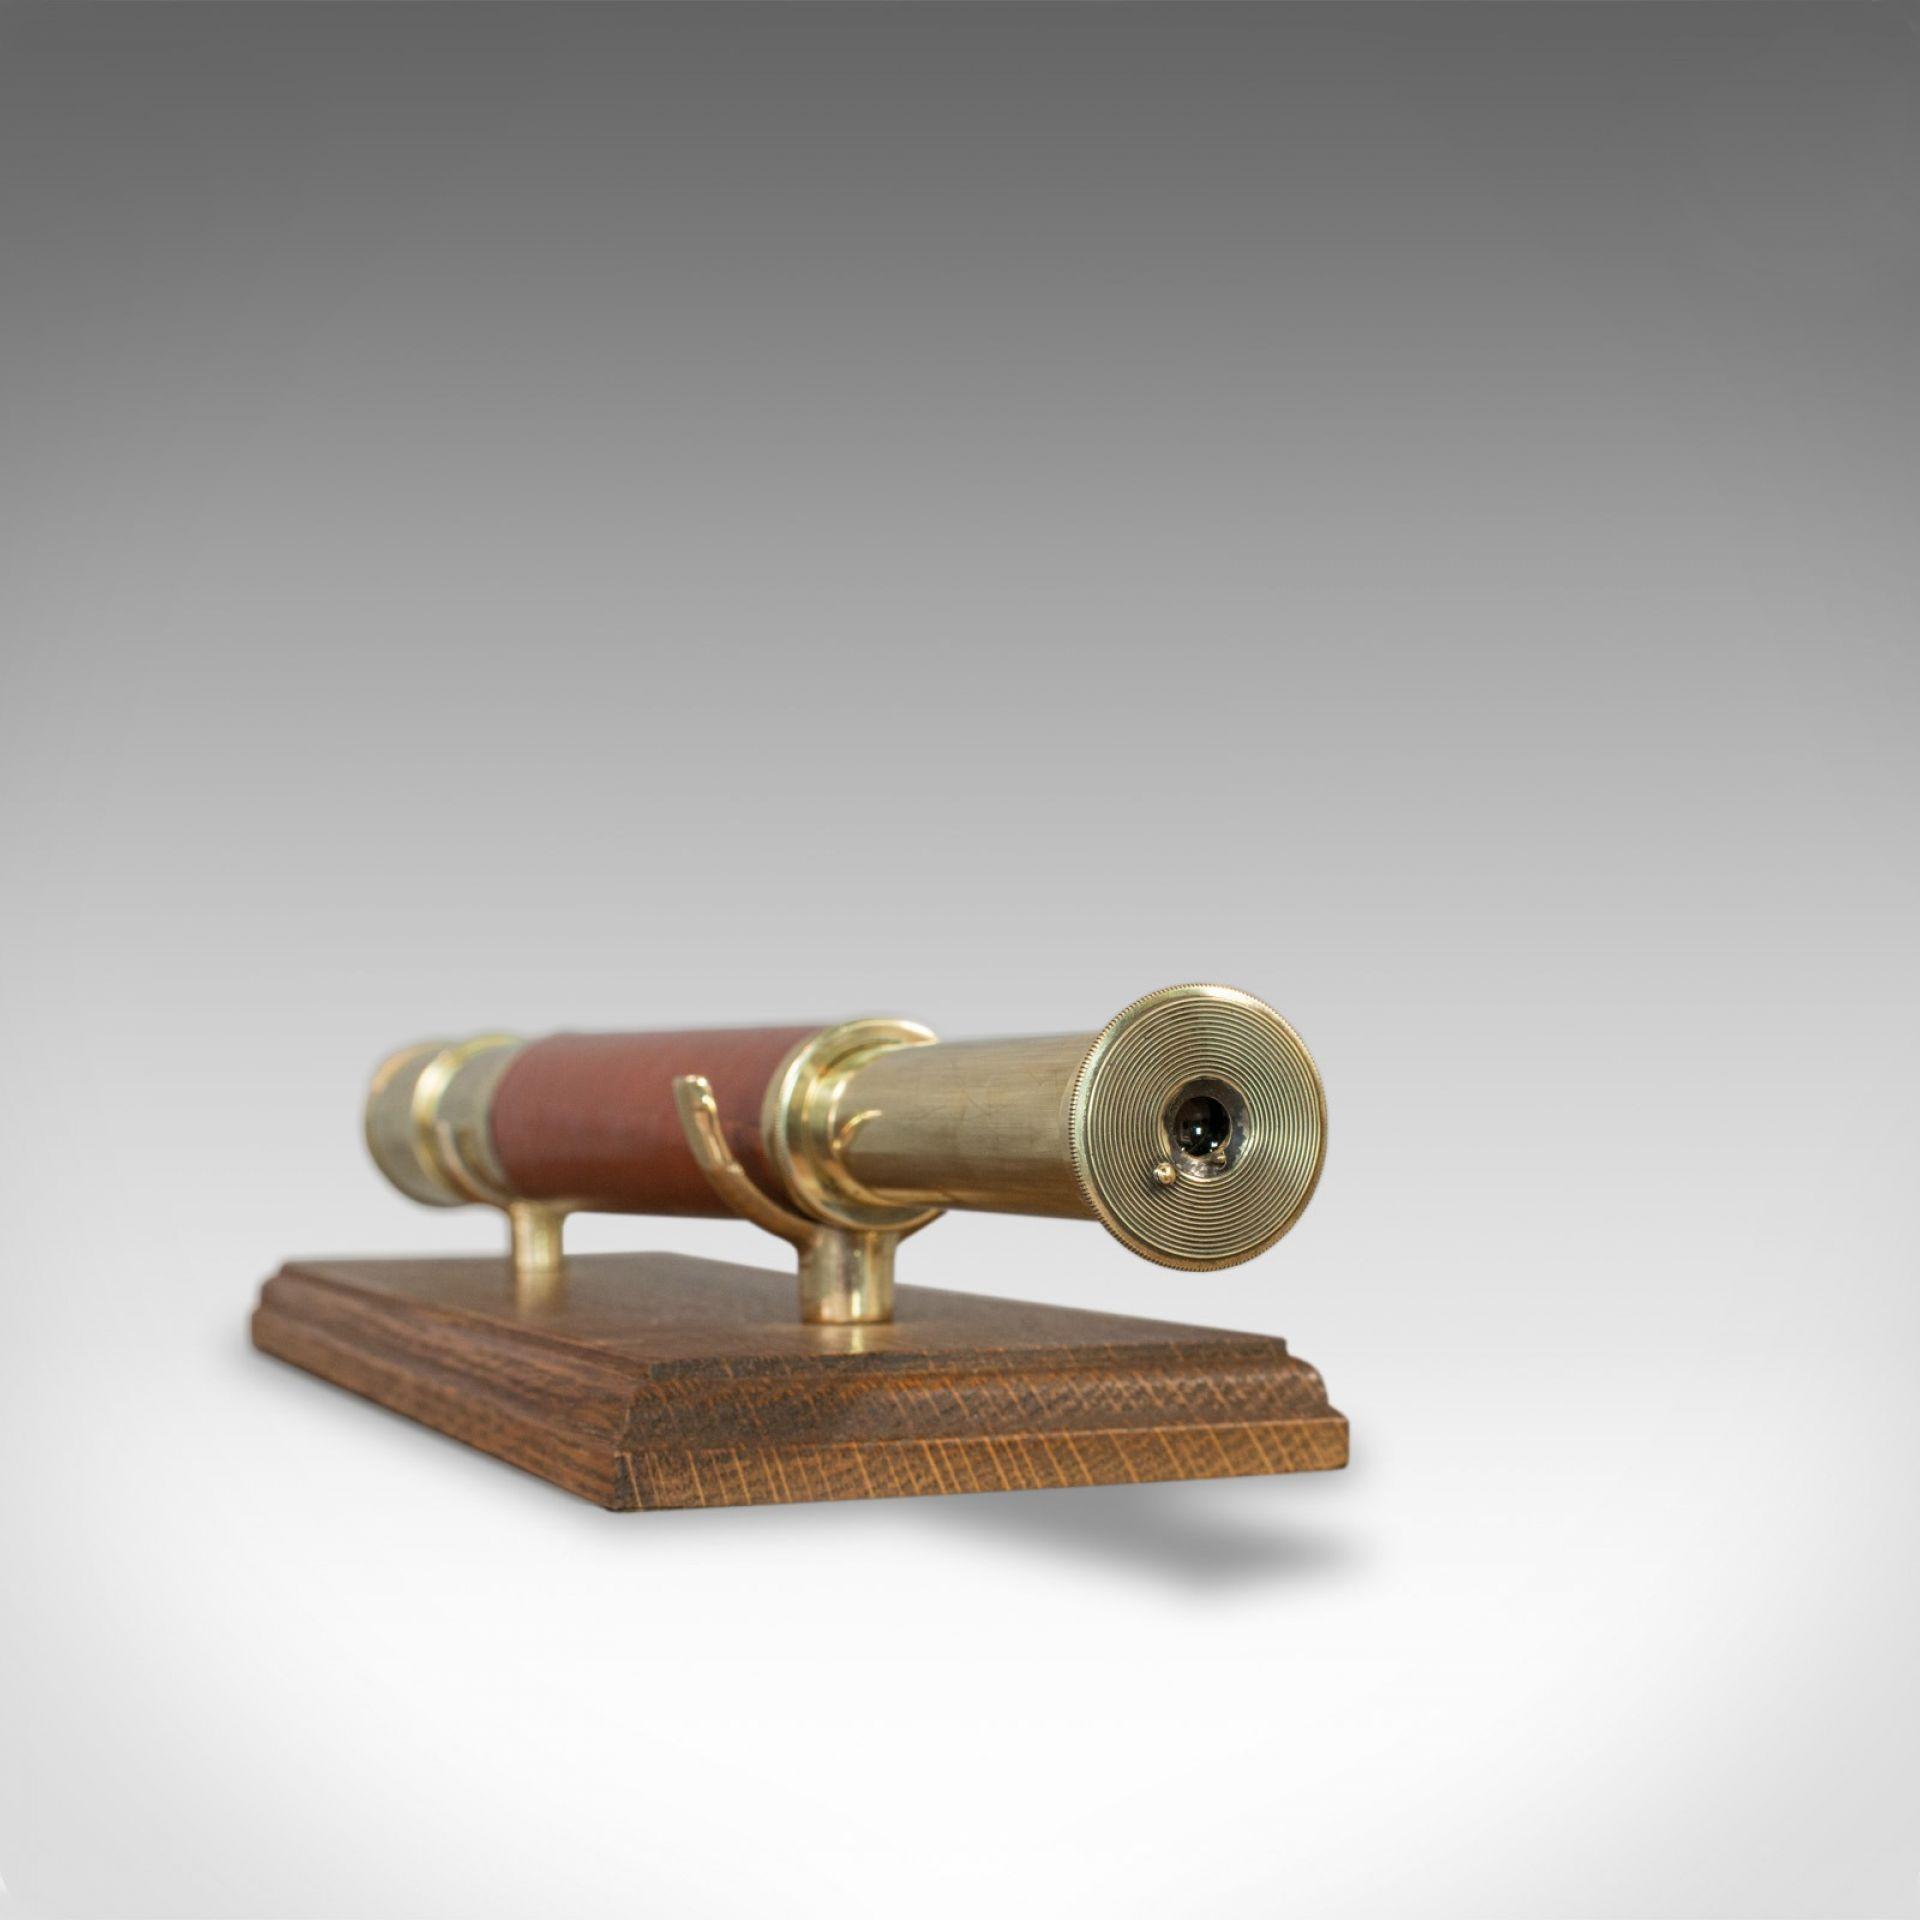 Antique Telescope, English, Single Draw, Terrestrial, Astronomical, Circa 1790